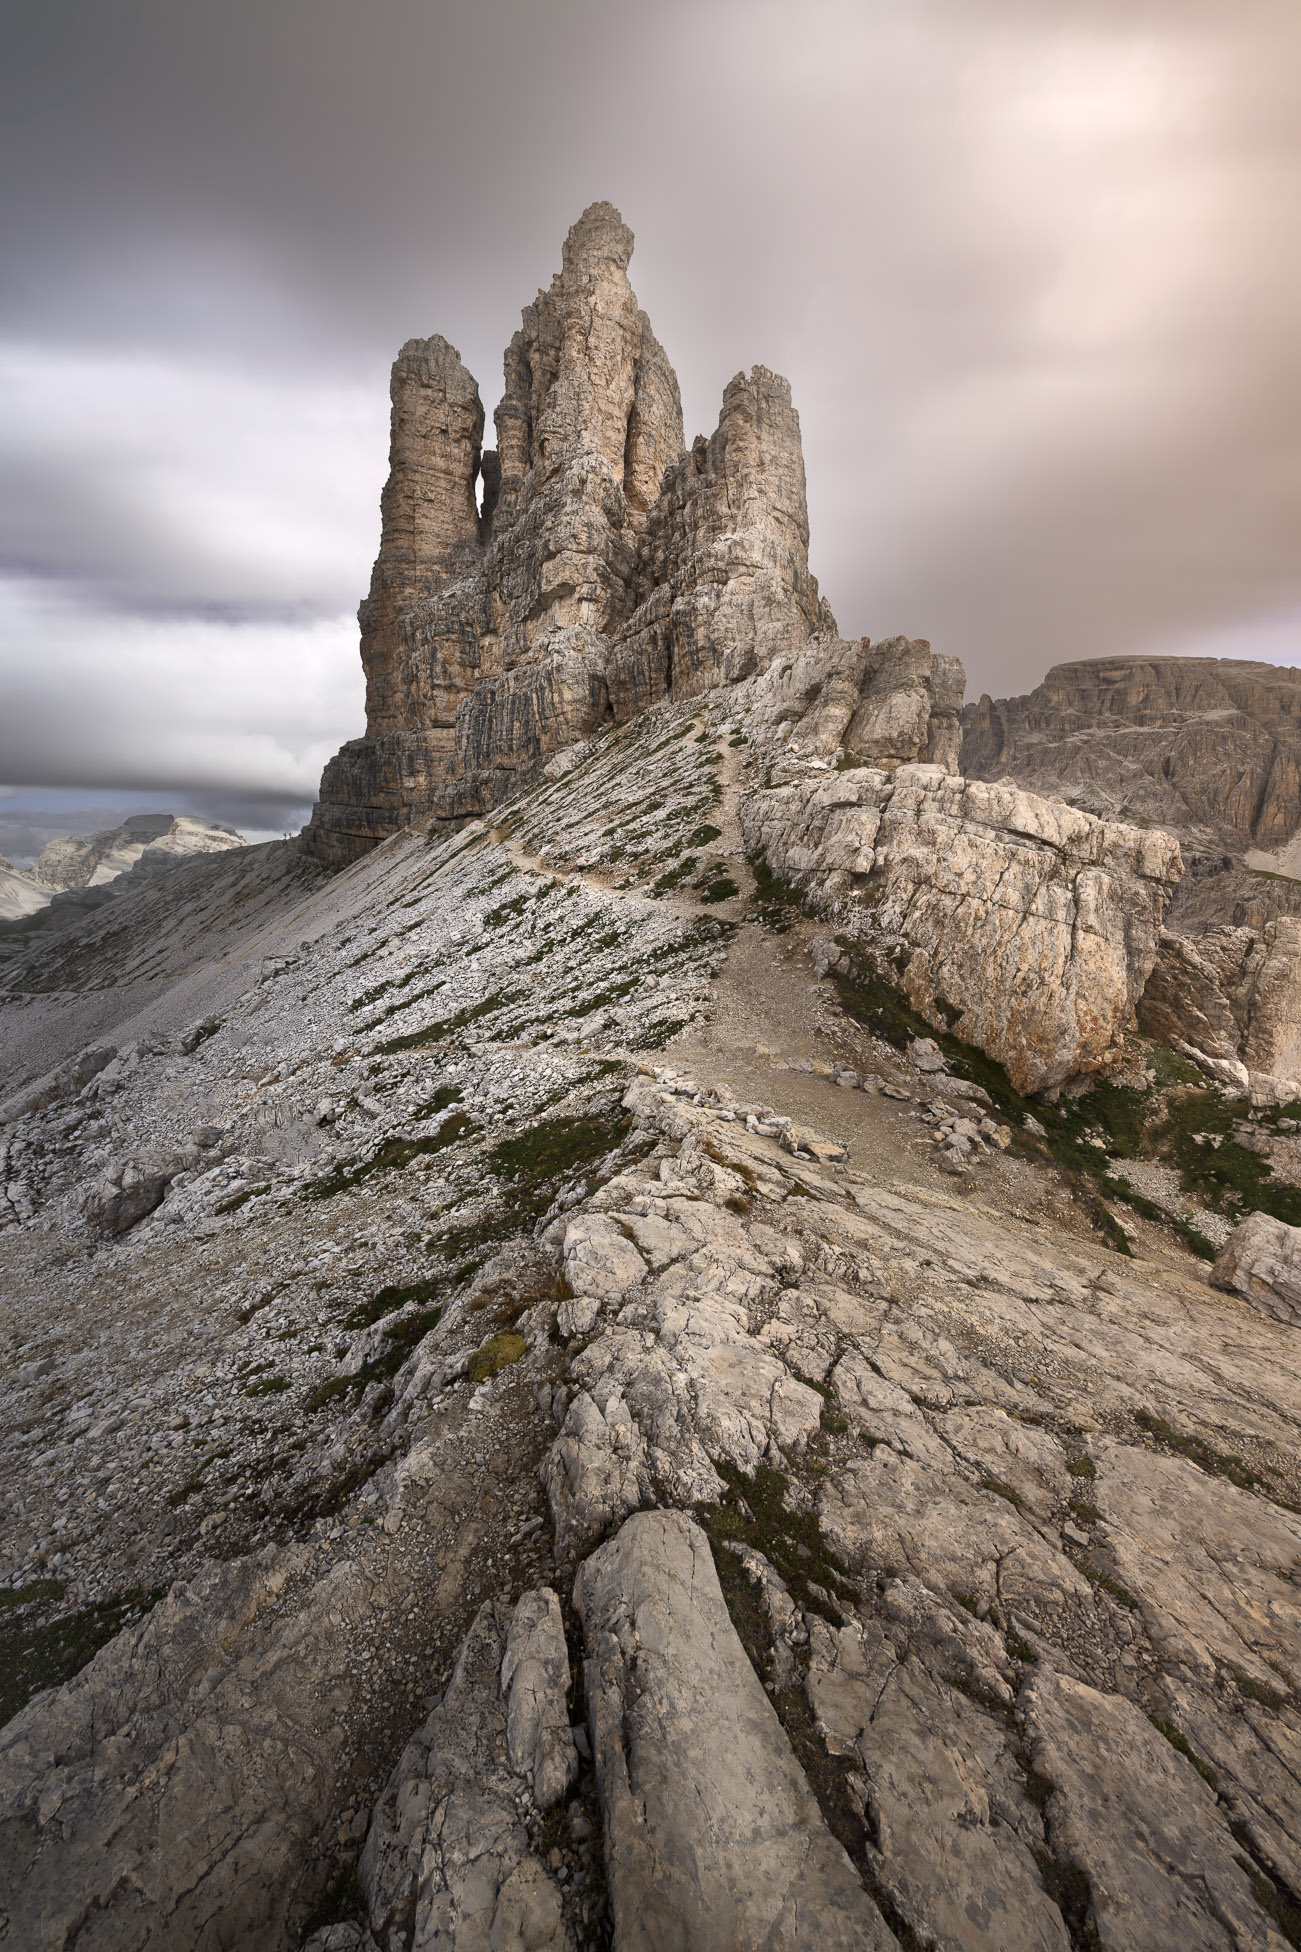 Torre di Toblin (Toblinger Knoten), Sexten Dolomites (Sesto Dolomites), Italy